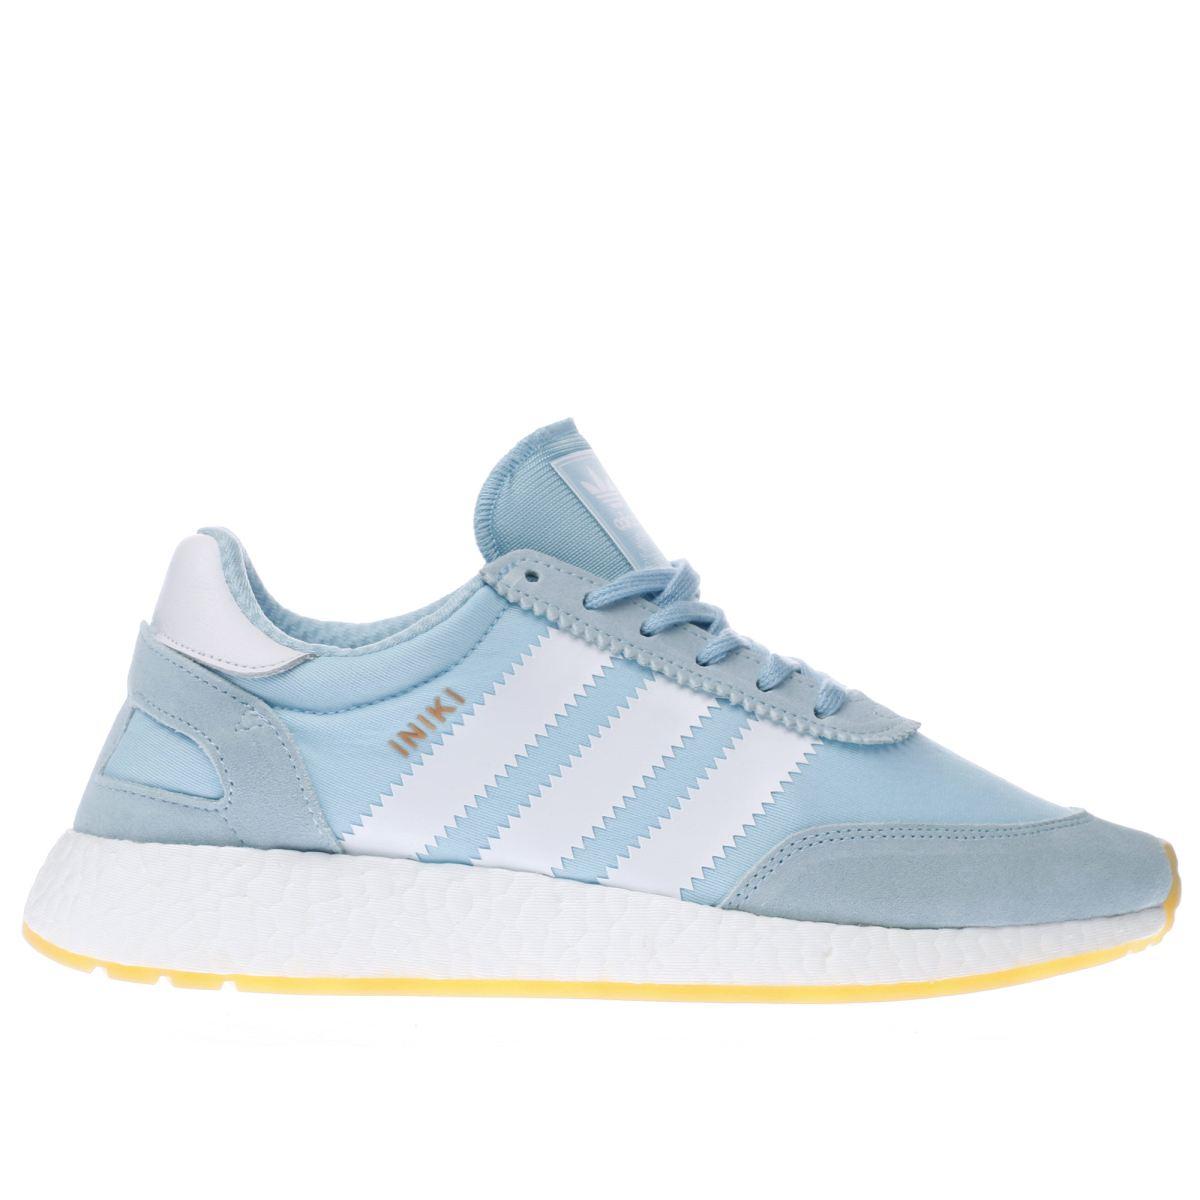 adidas pale blue iniki runner trainers